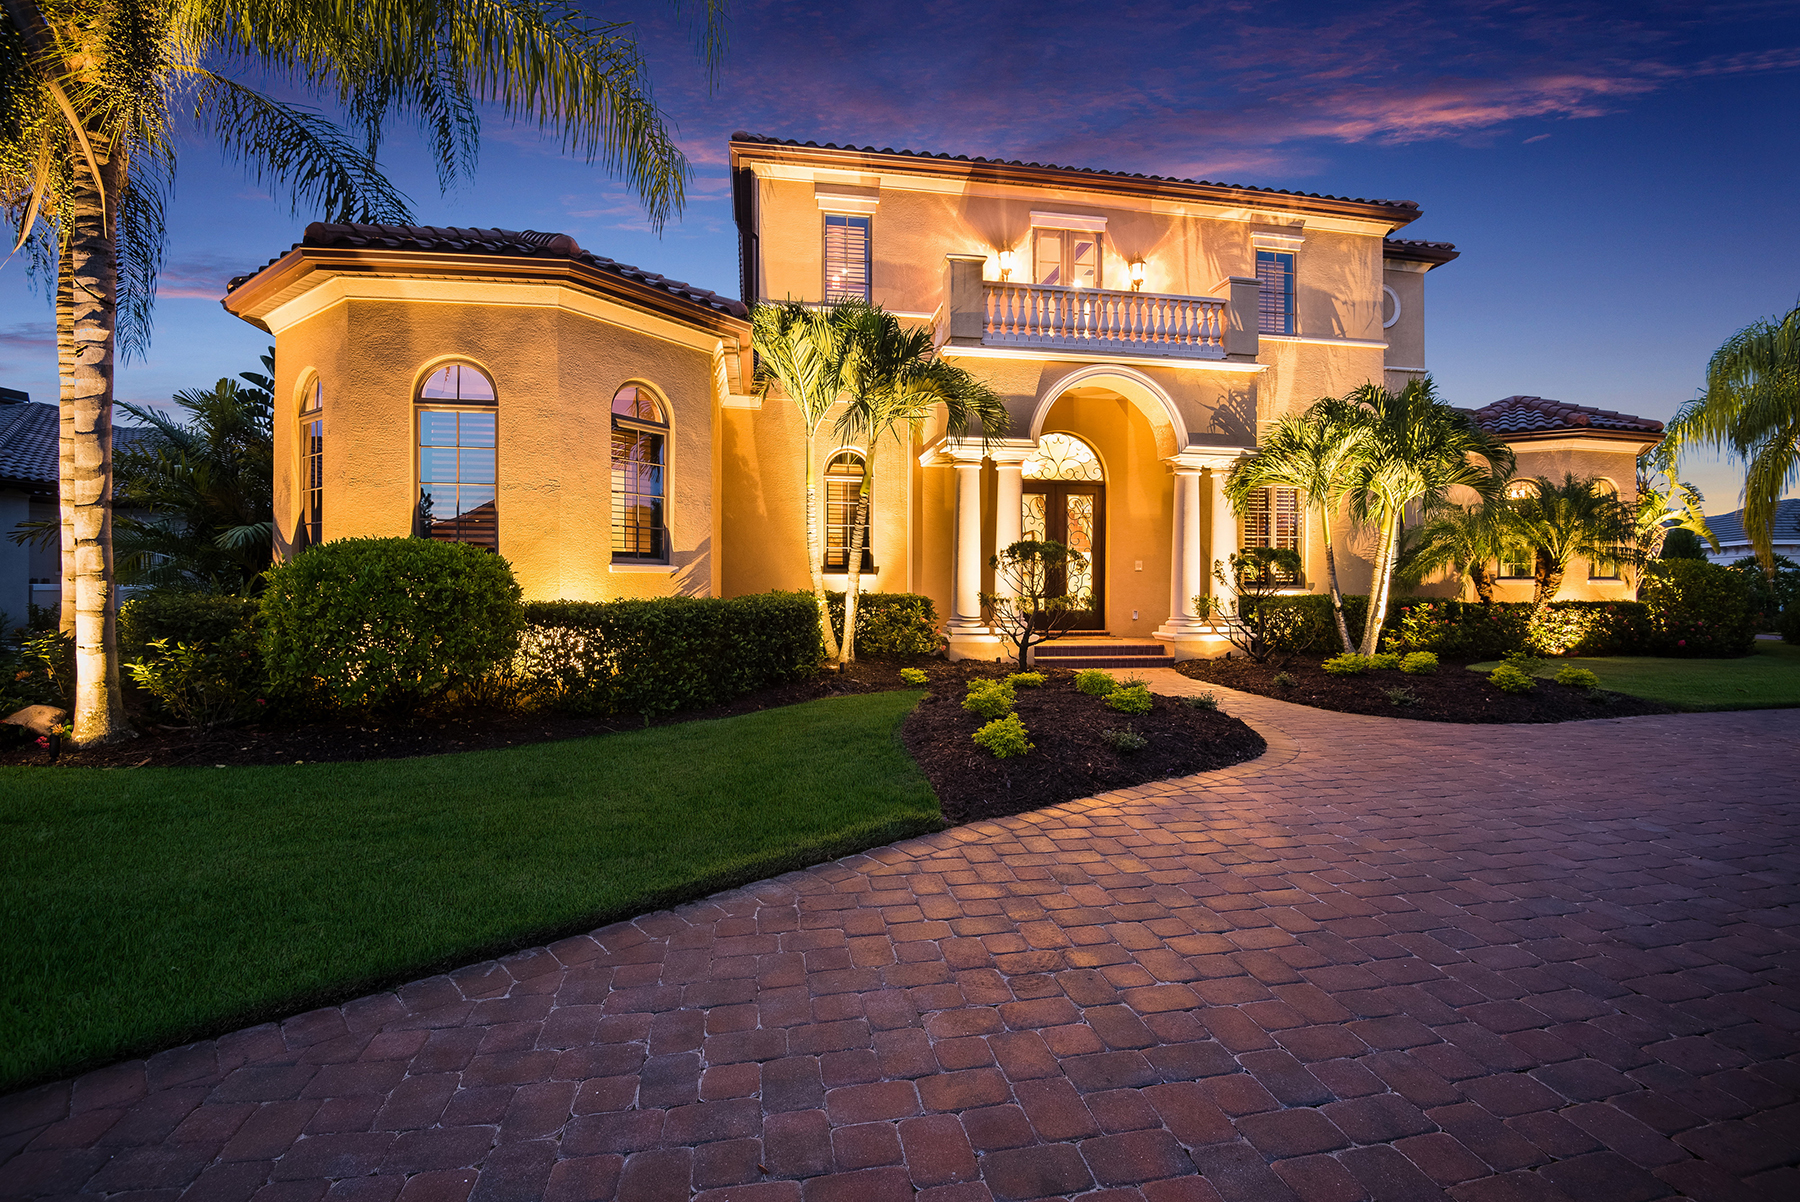 Single Family Home for Sale at LAKE CLUB 8365 Catamaran Cir Lakewood Ranch, Florida, 34202 United States